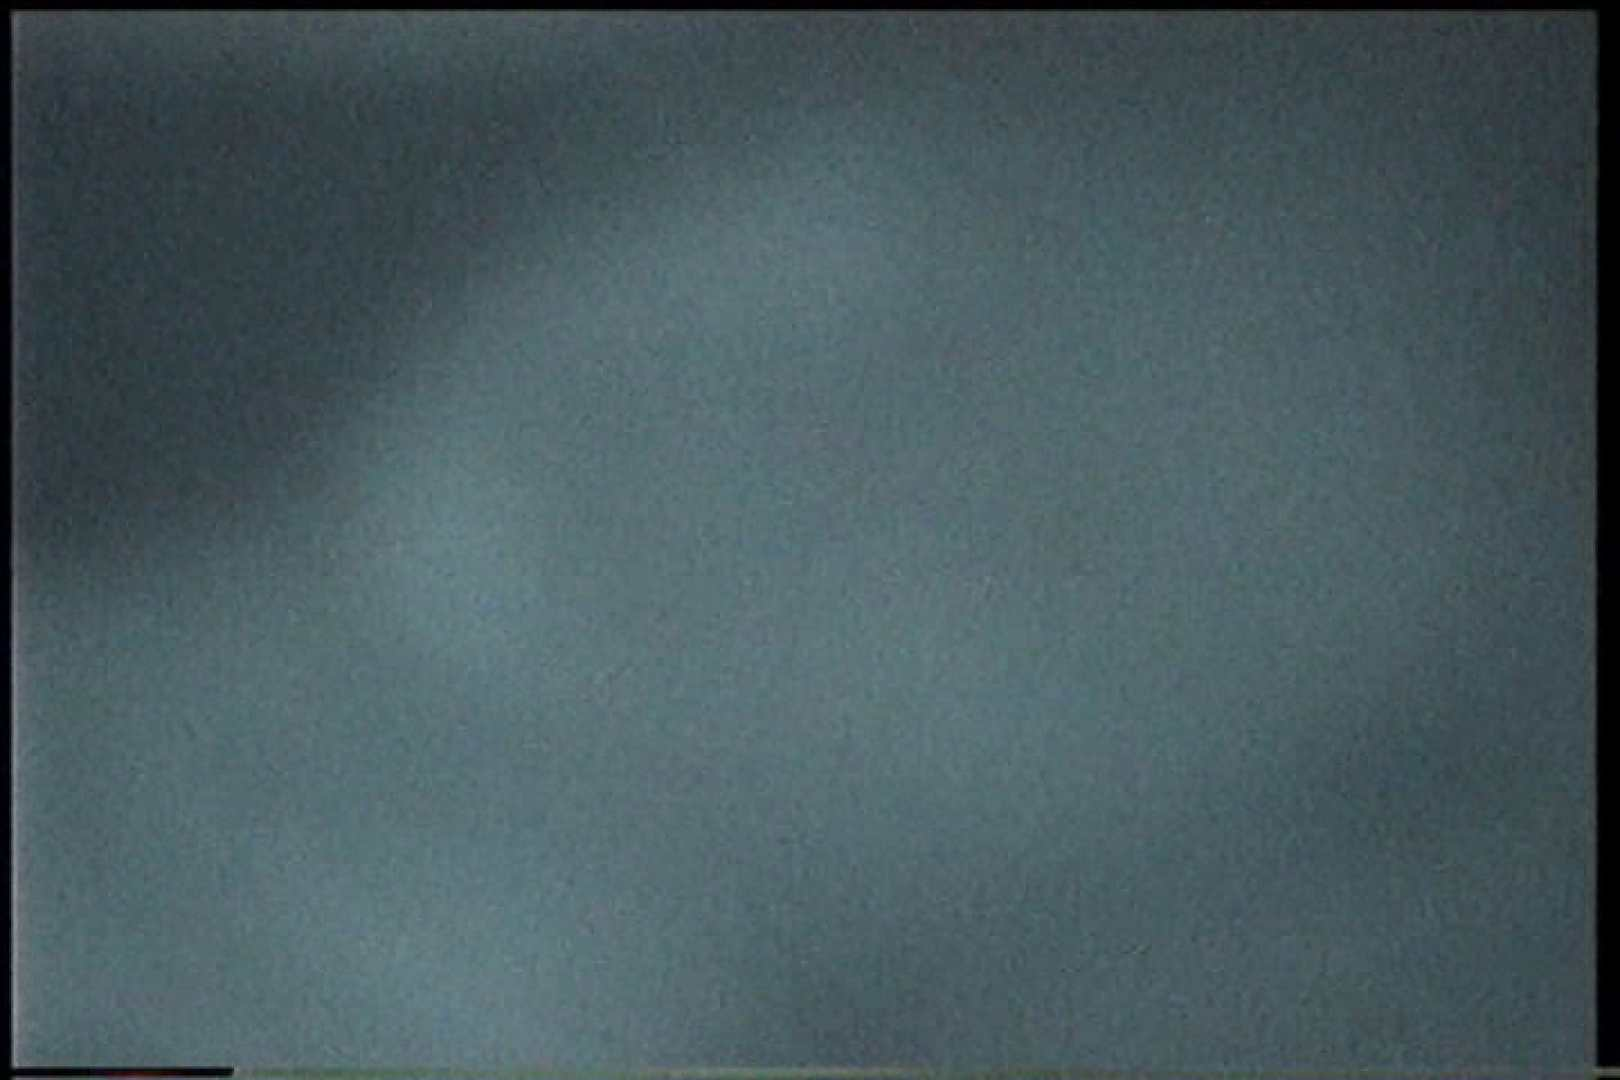 充血監督の深夜の運動会Vol.179 手マン 盗撮動画紹介 96pic 43